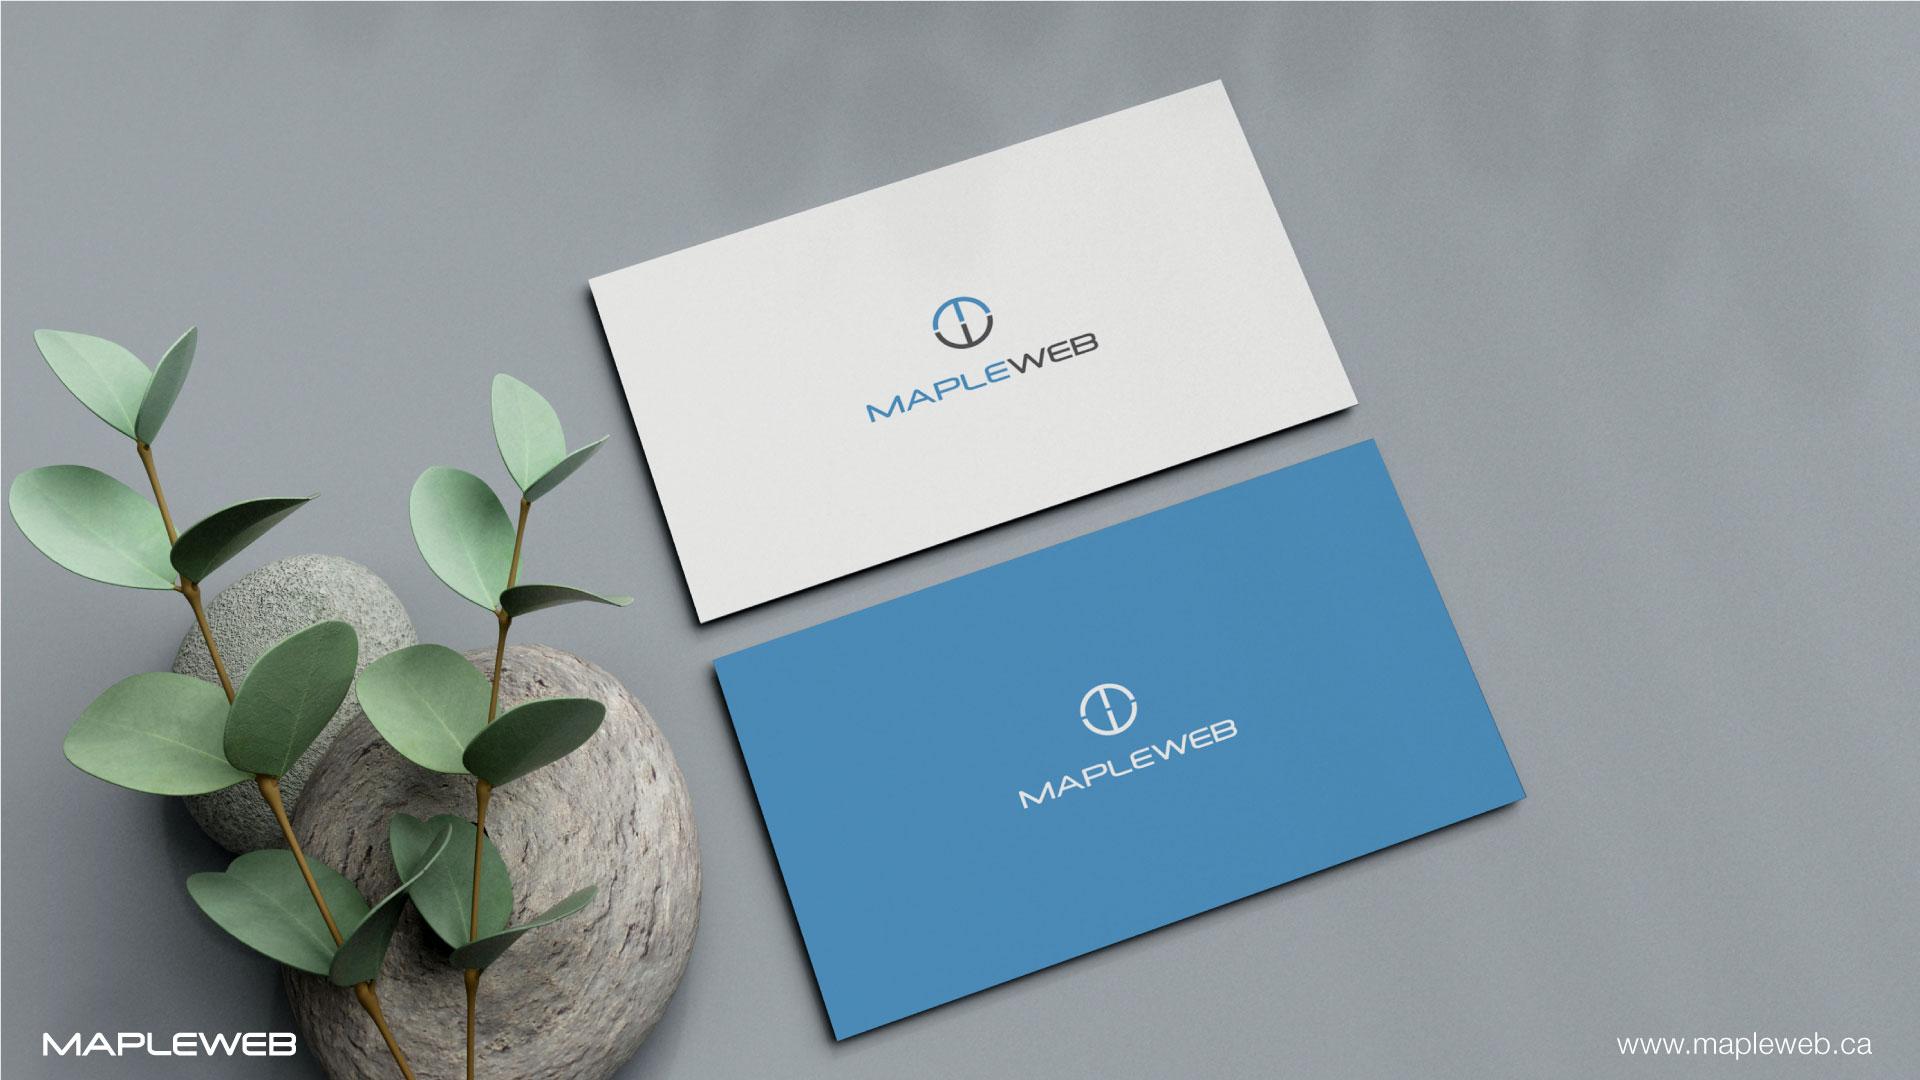 mapleweb-brand-logo-design-by-mapleweb-vancouver-canada-business-card-mock